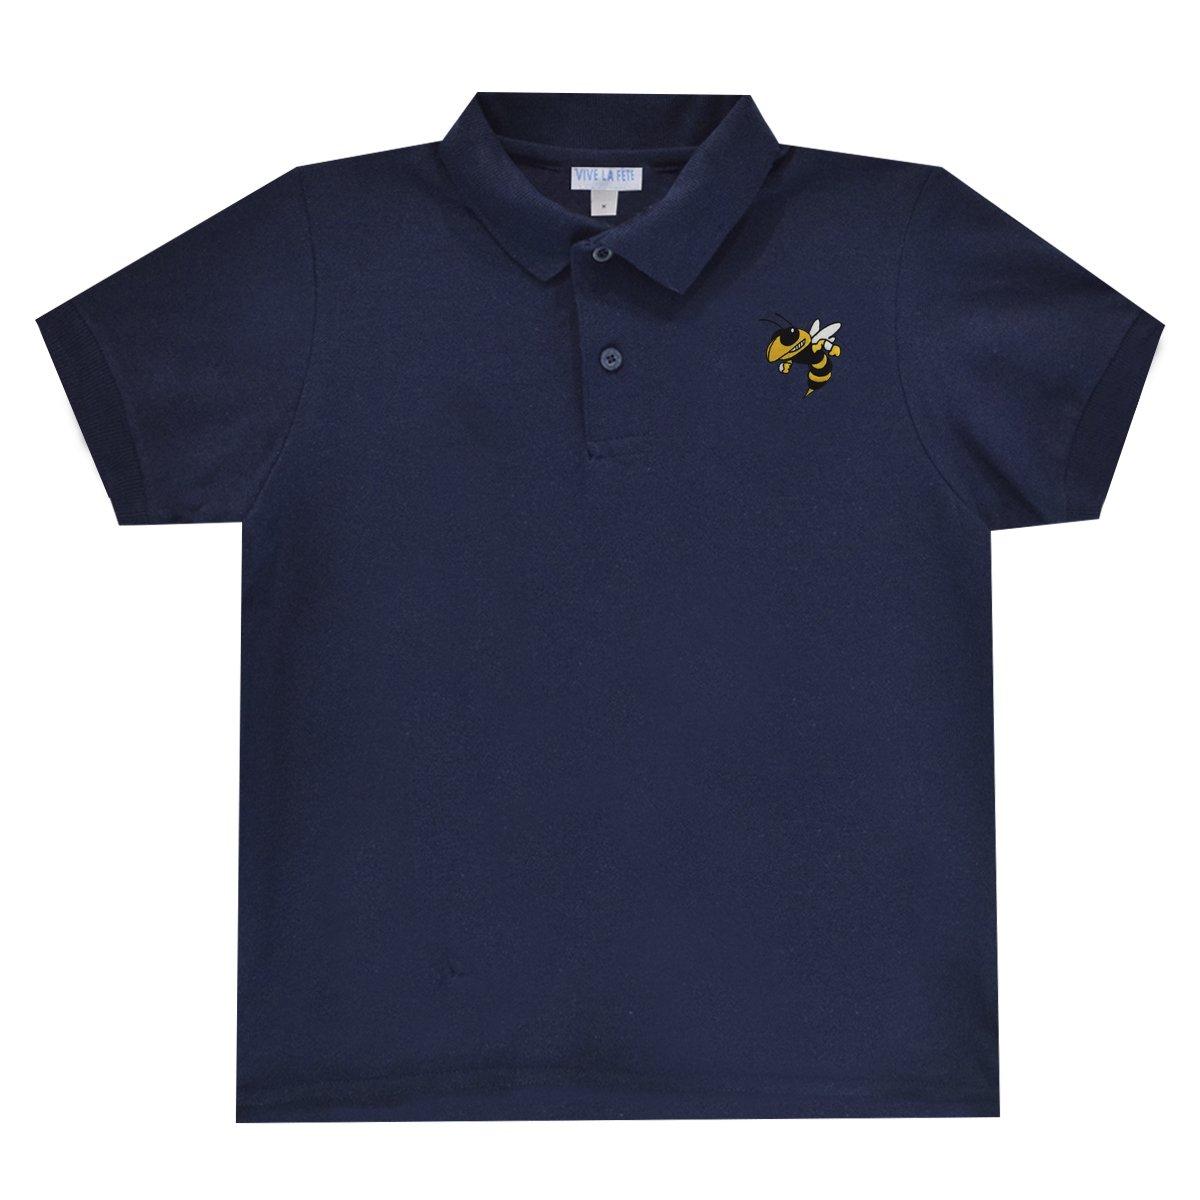 Georgia Tech Yellow Jackets Navy Polo Box Shirt Short Sleeve by Vive La Fete by Vive La Fete Collegiate